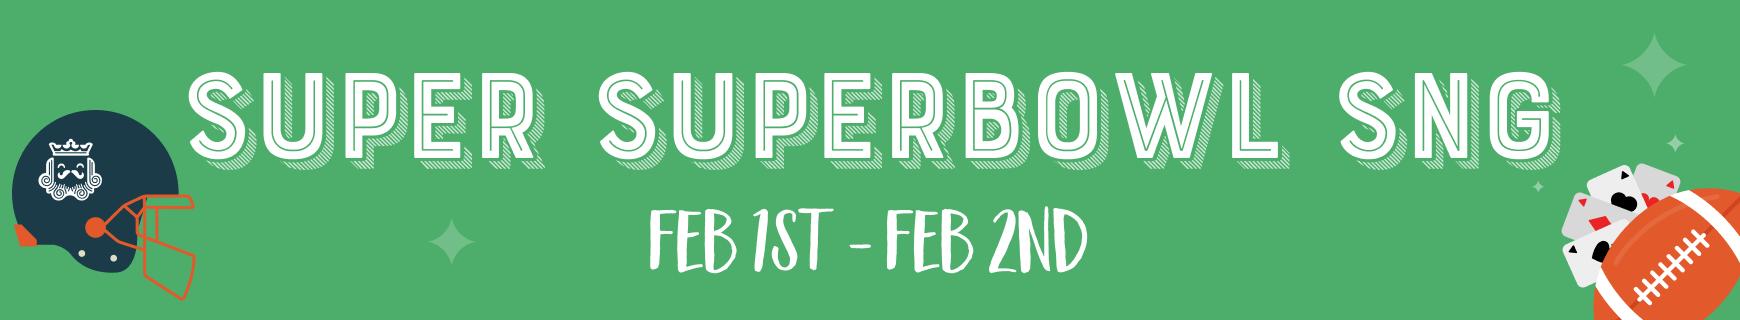 Super superbowl sng 2020   dashboard %28870 x 160%29 2x